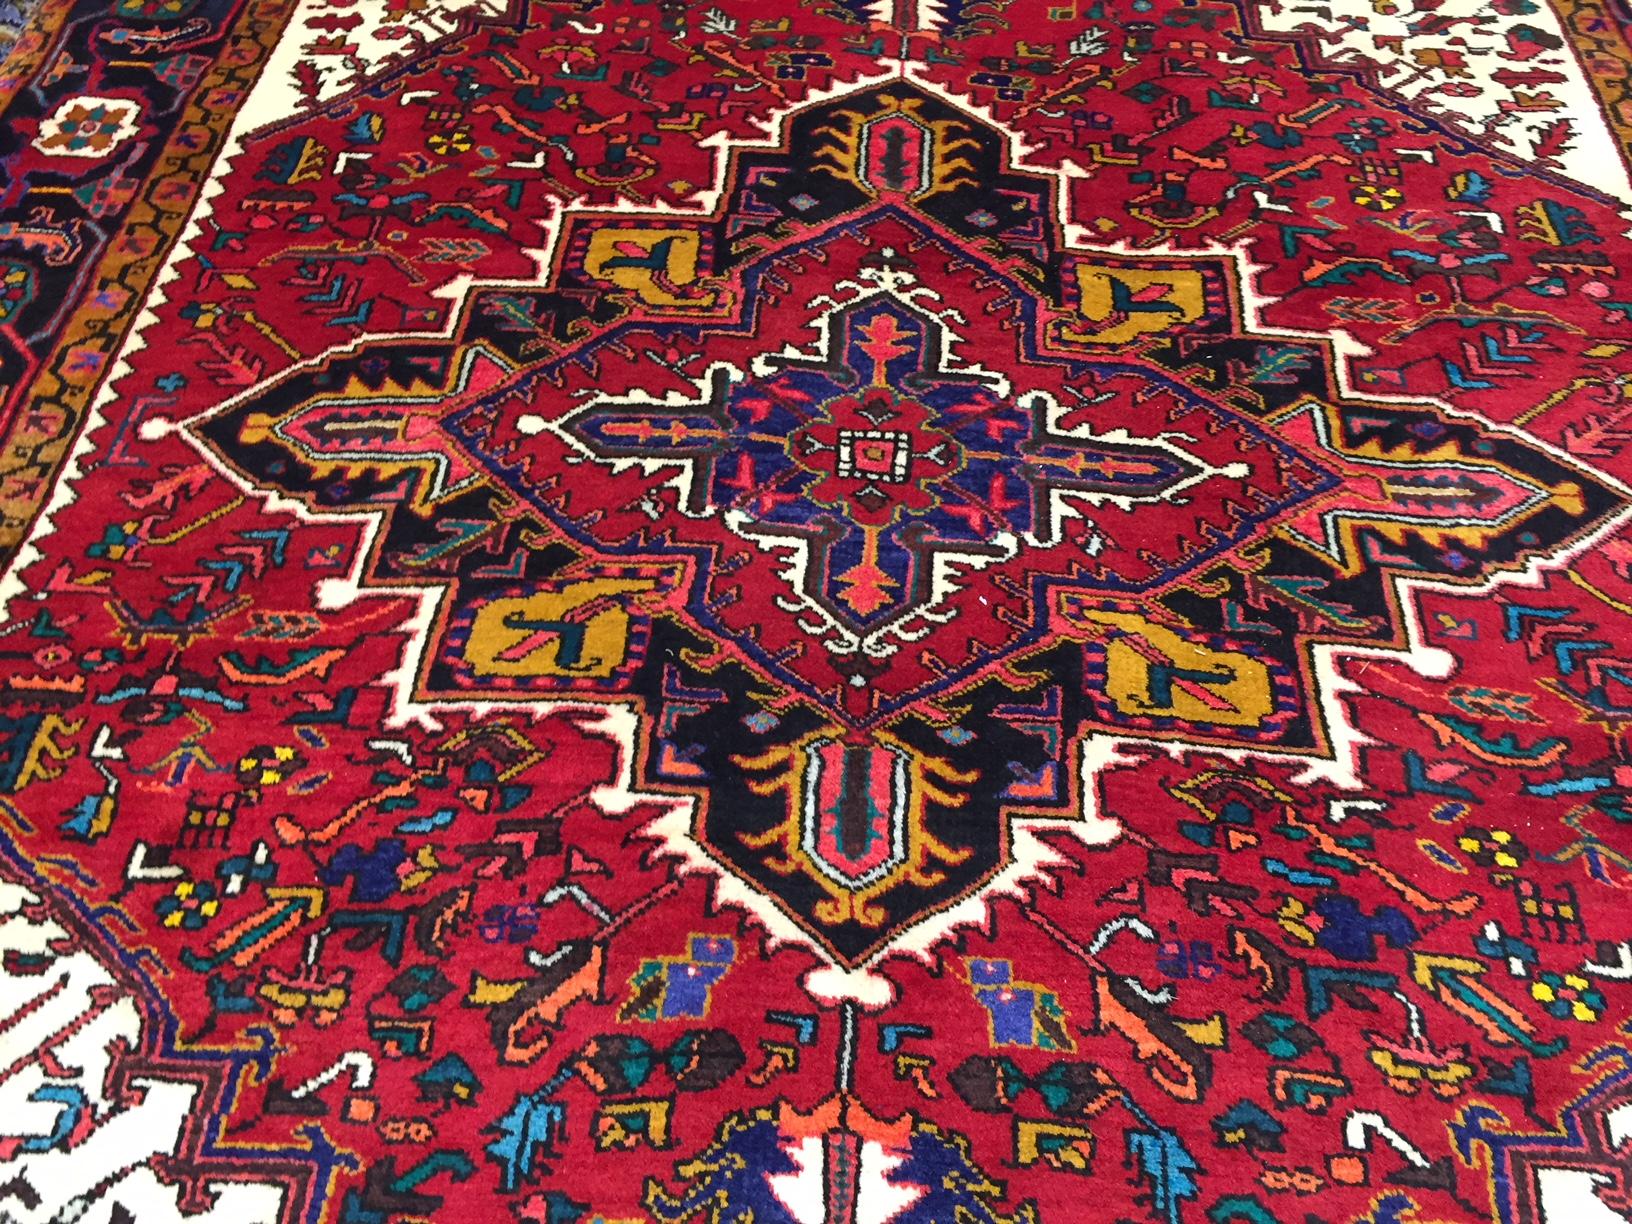 Persian Rug Richmond Hill Rug Toronto Rug Markham Rug